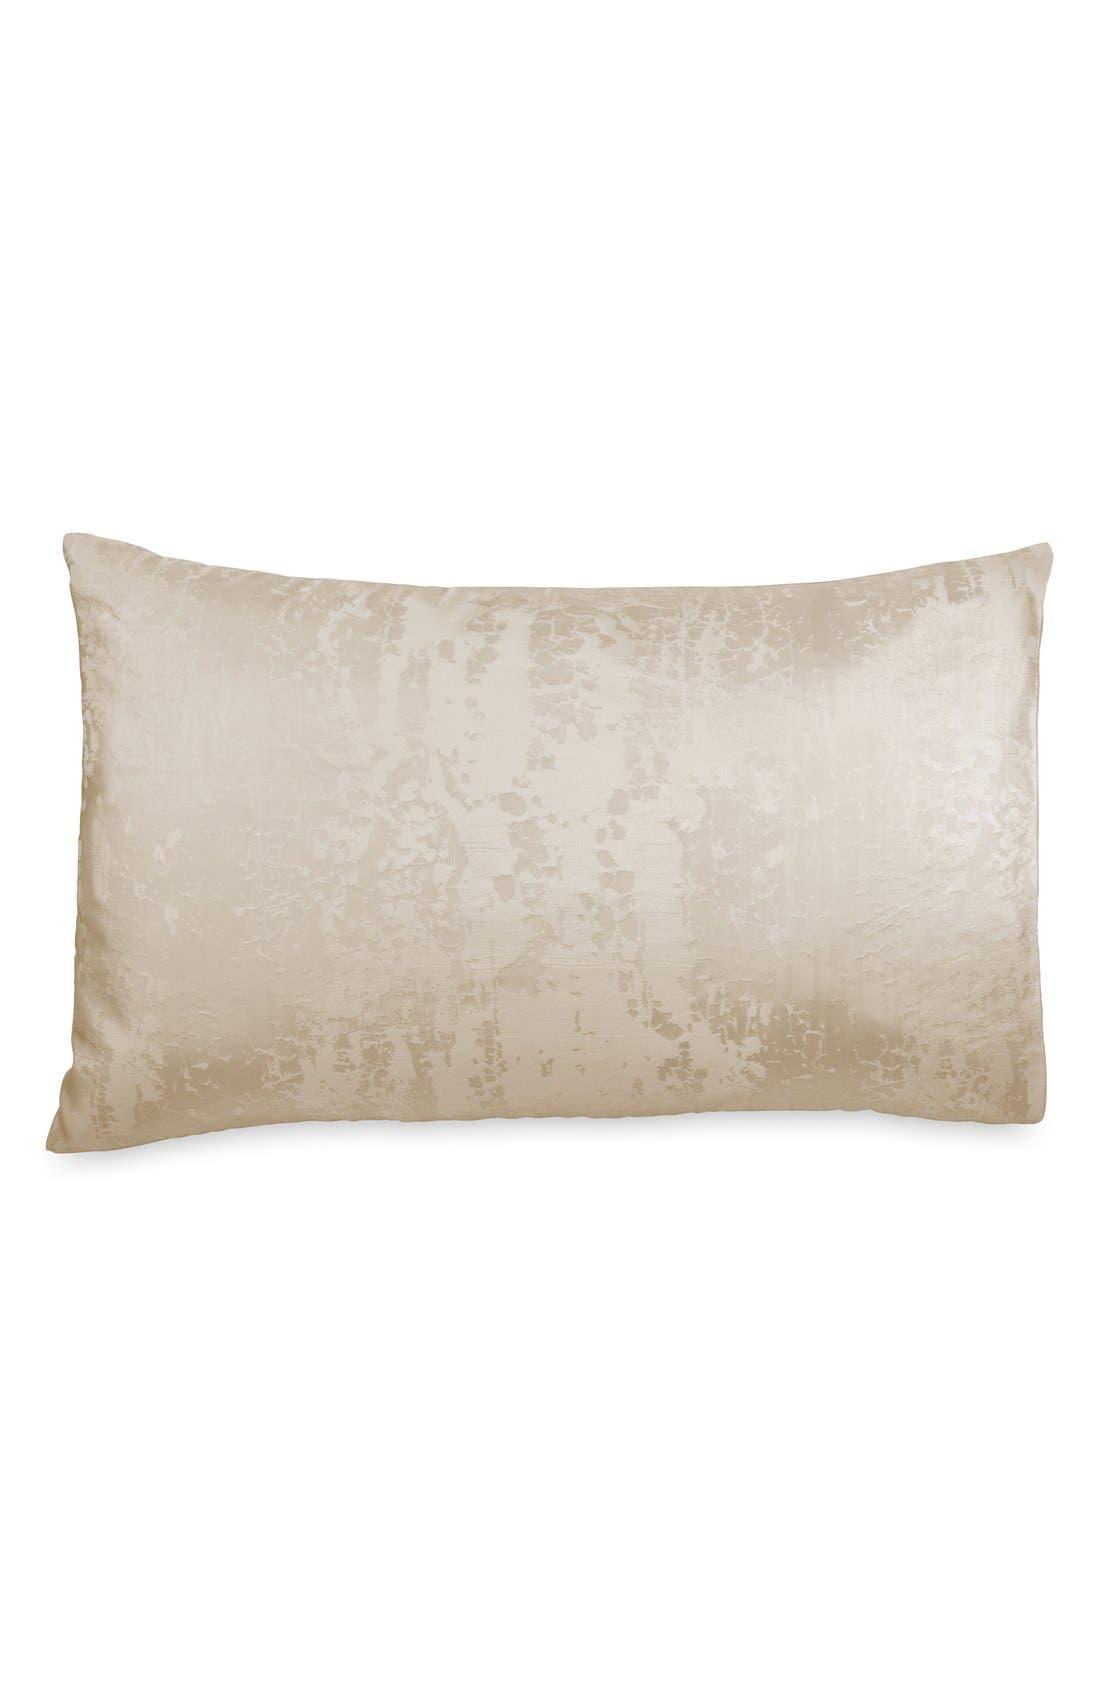 Donna Karan Collection 'Moonscape' Pillow Sham